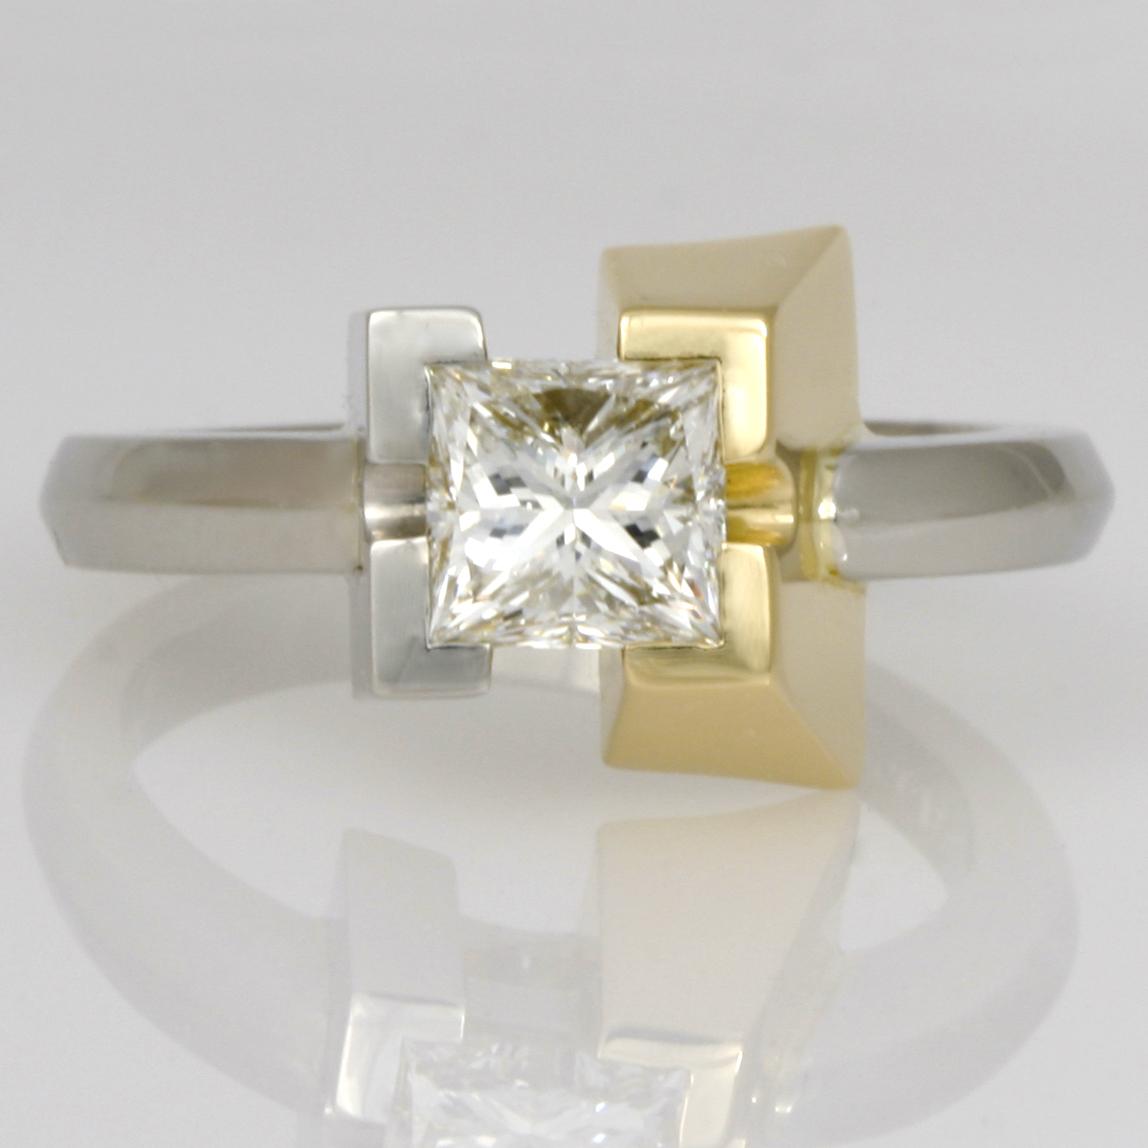 Handmade ladies palladium and 18ct yellow gold princess cut diamond ring